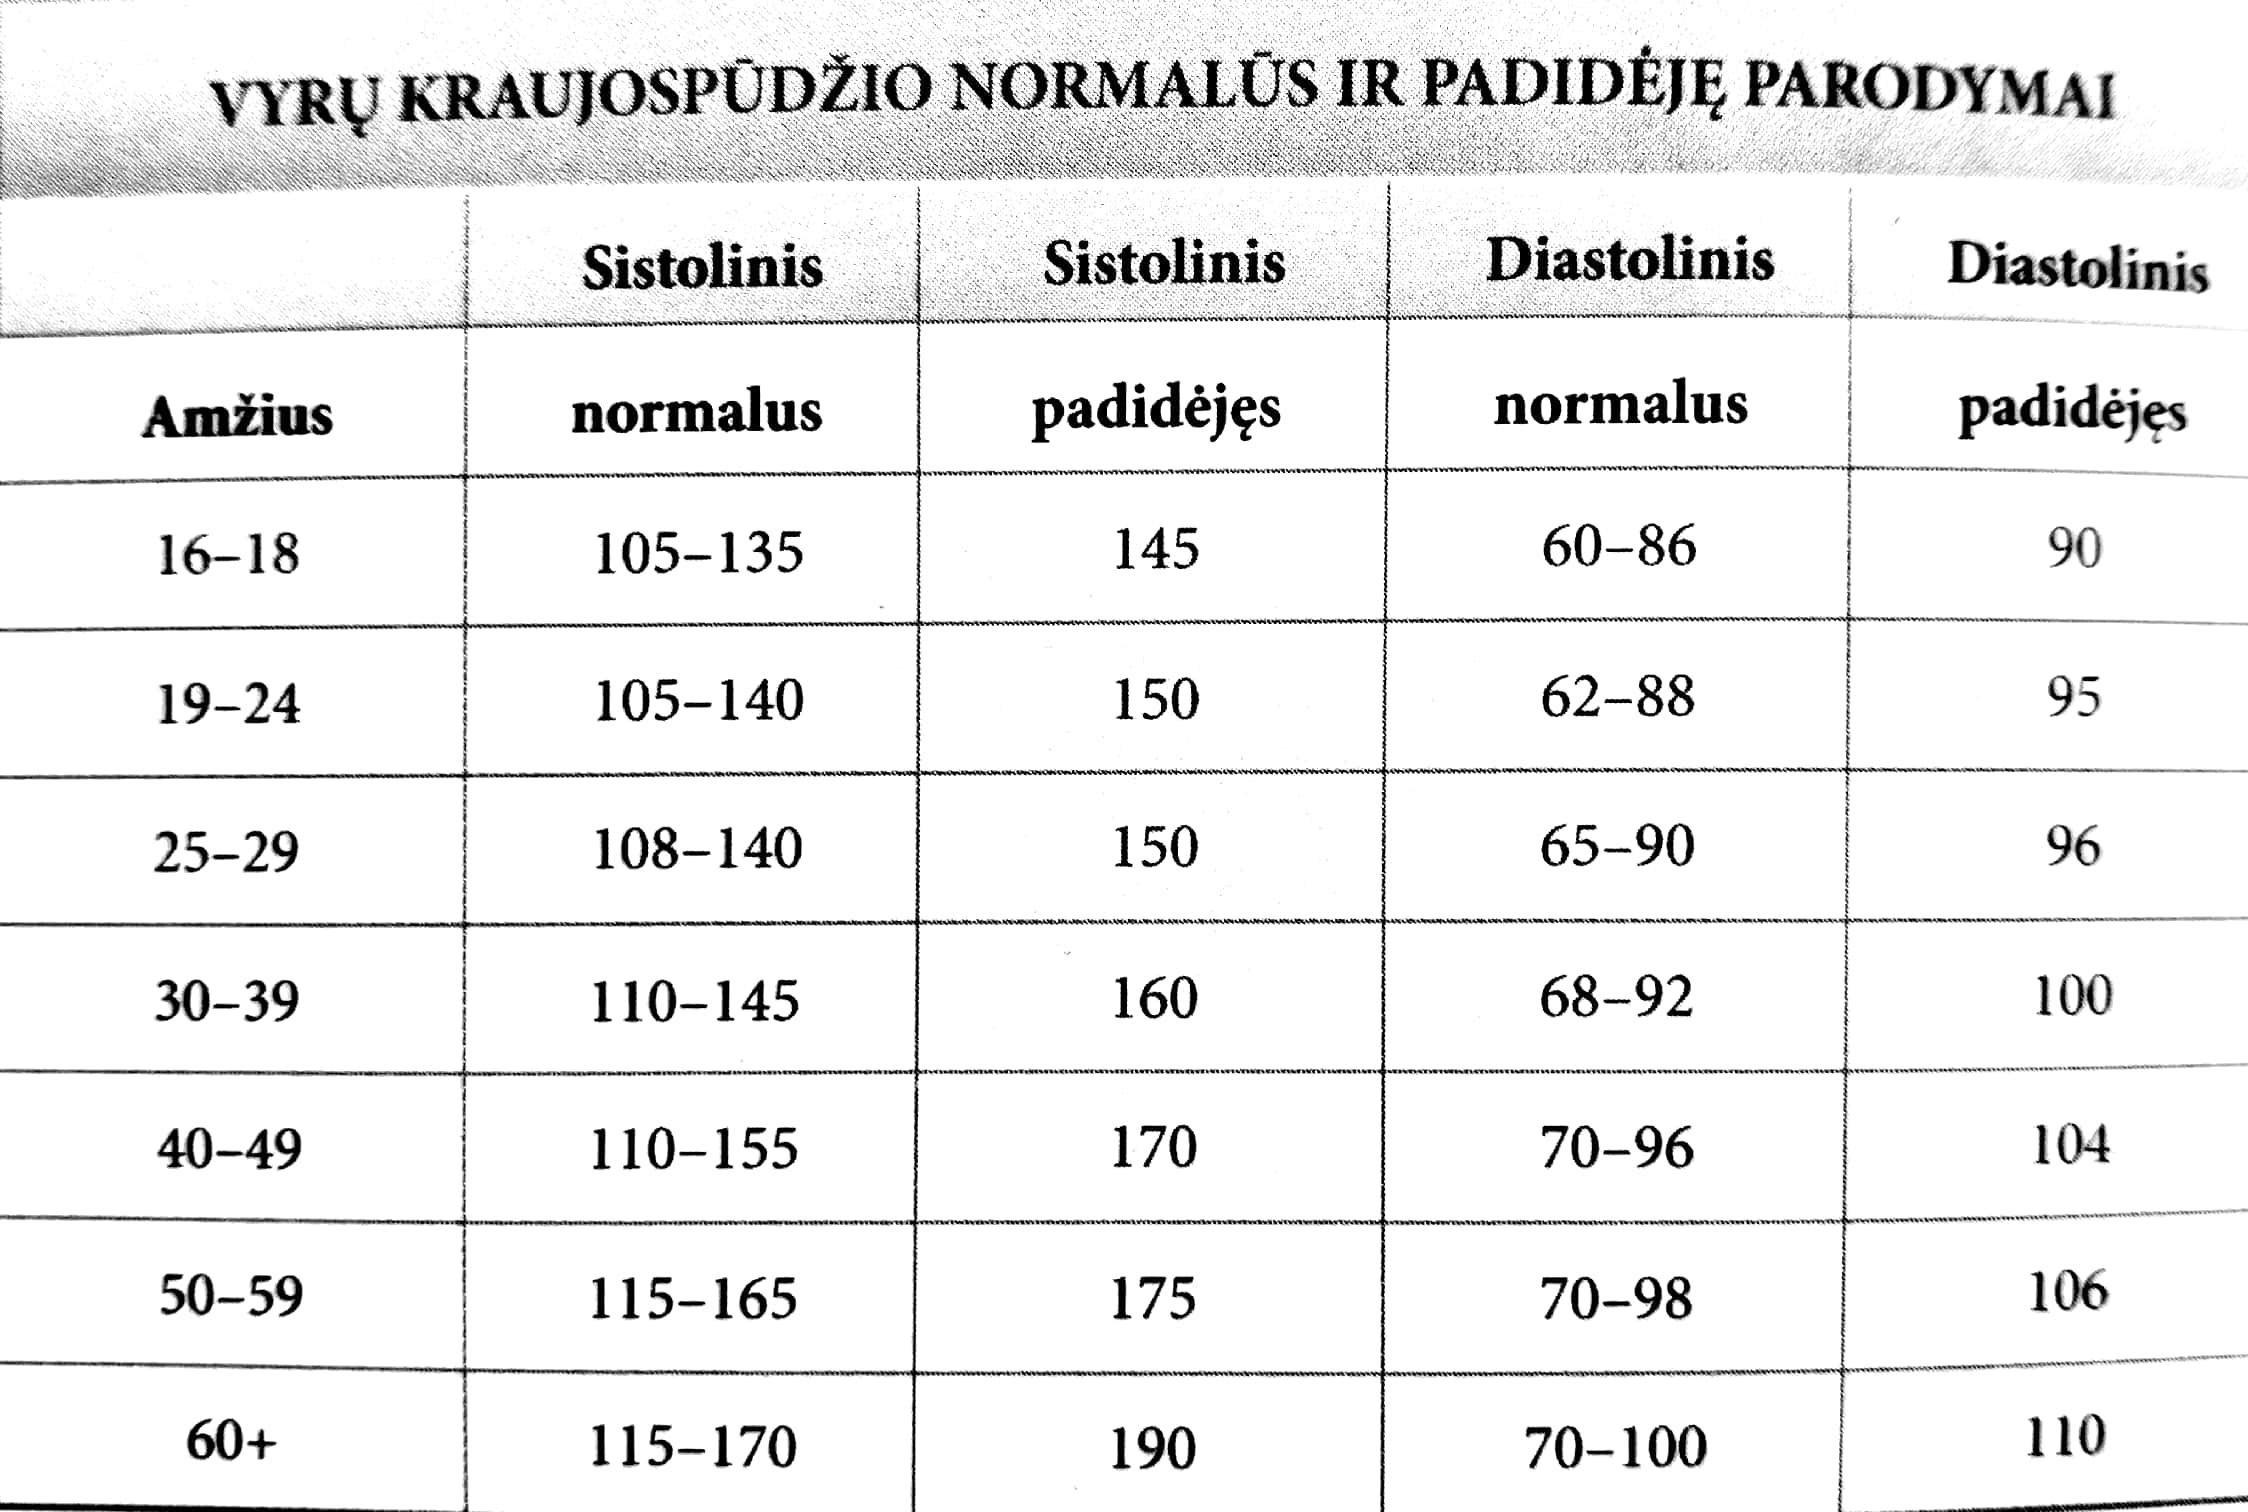 hipertenzija osteochondrozės gydymo fone hipertenzija st 3 rizika 4